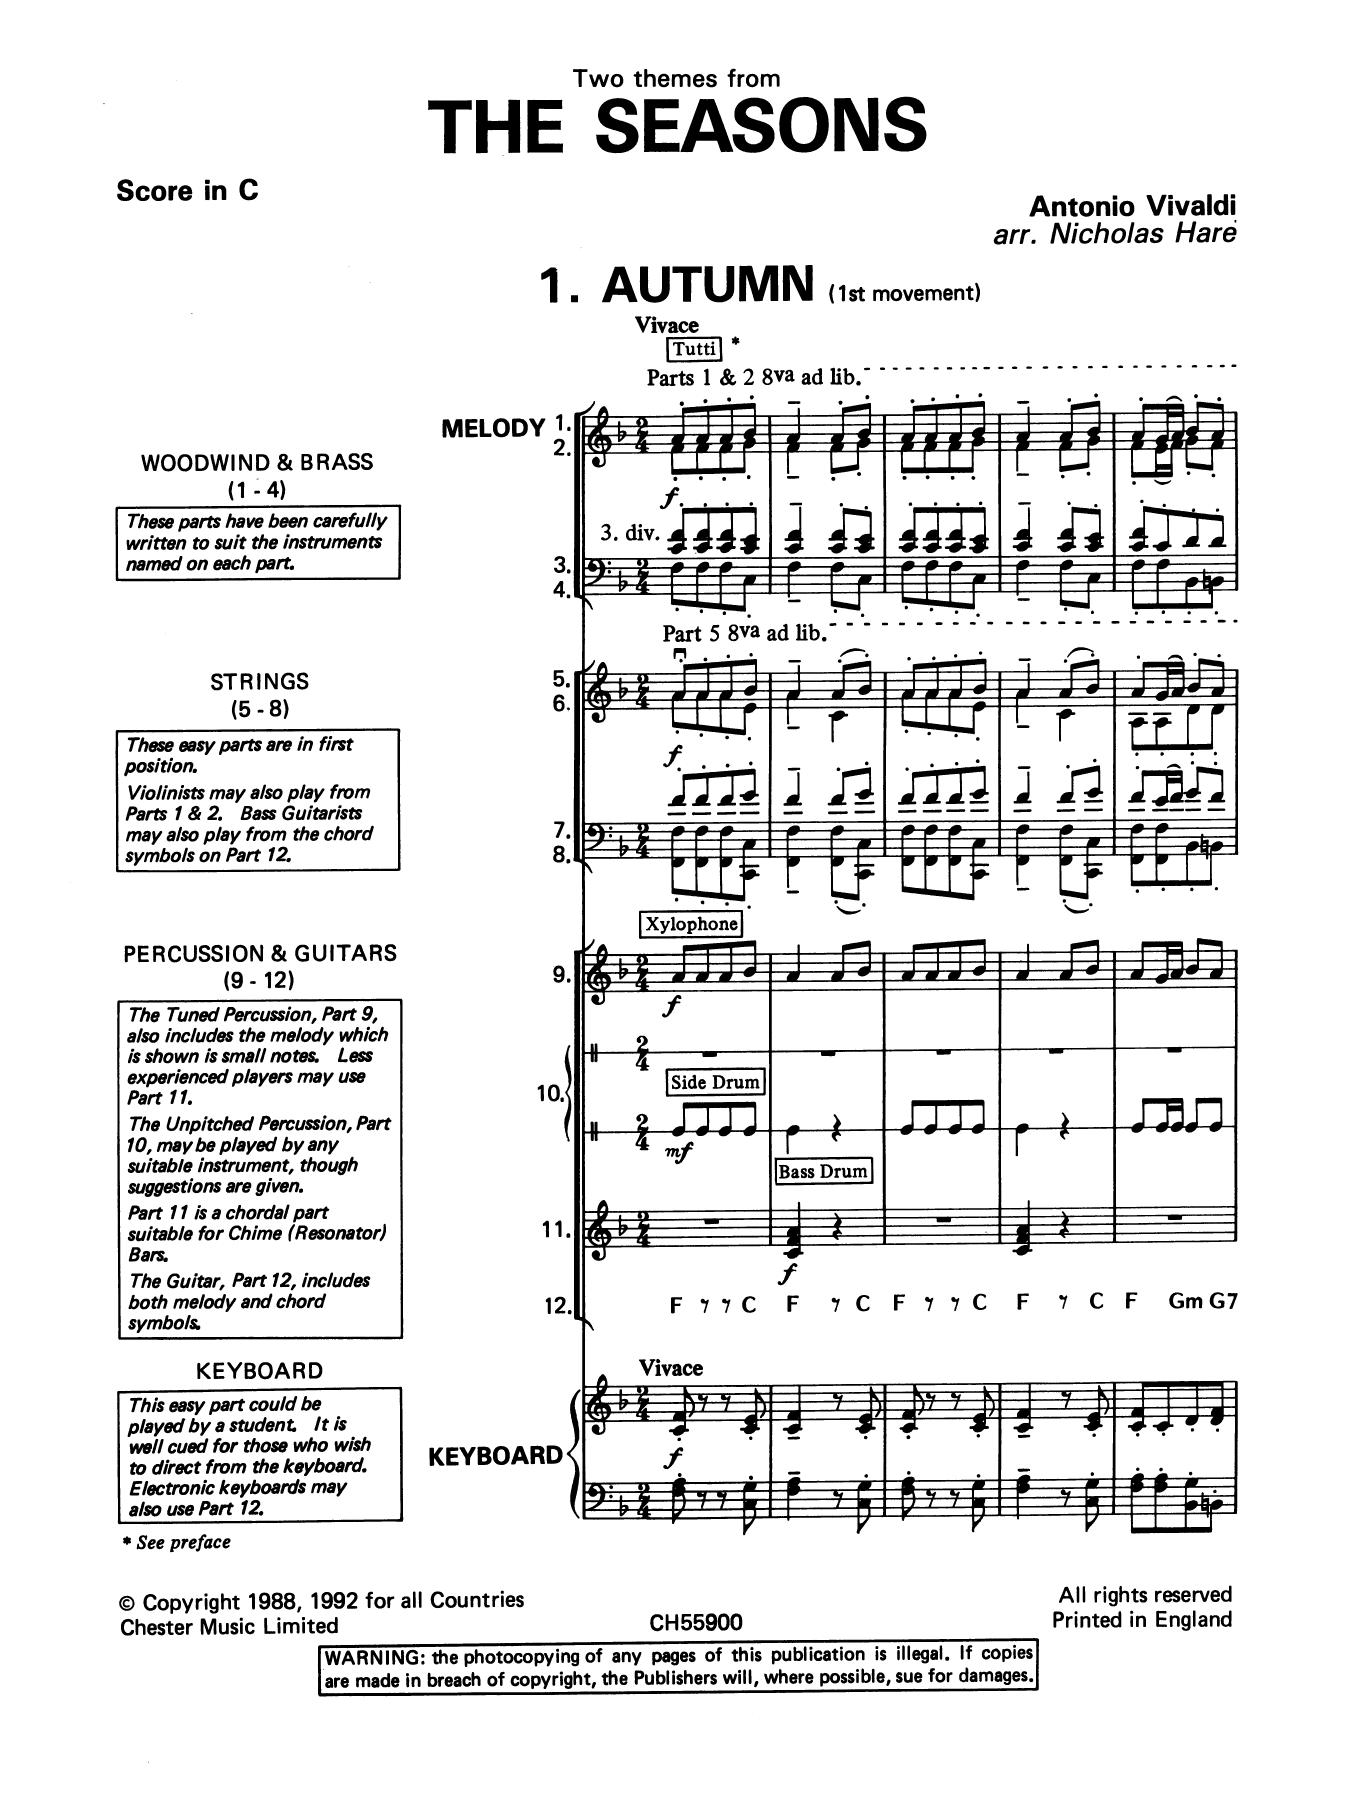 Antonio Vivaldi: Autumn and Winter (from The Four Seasons)